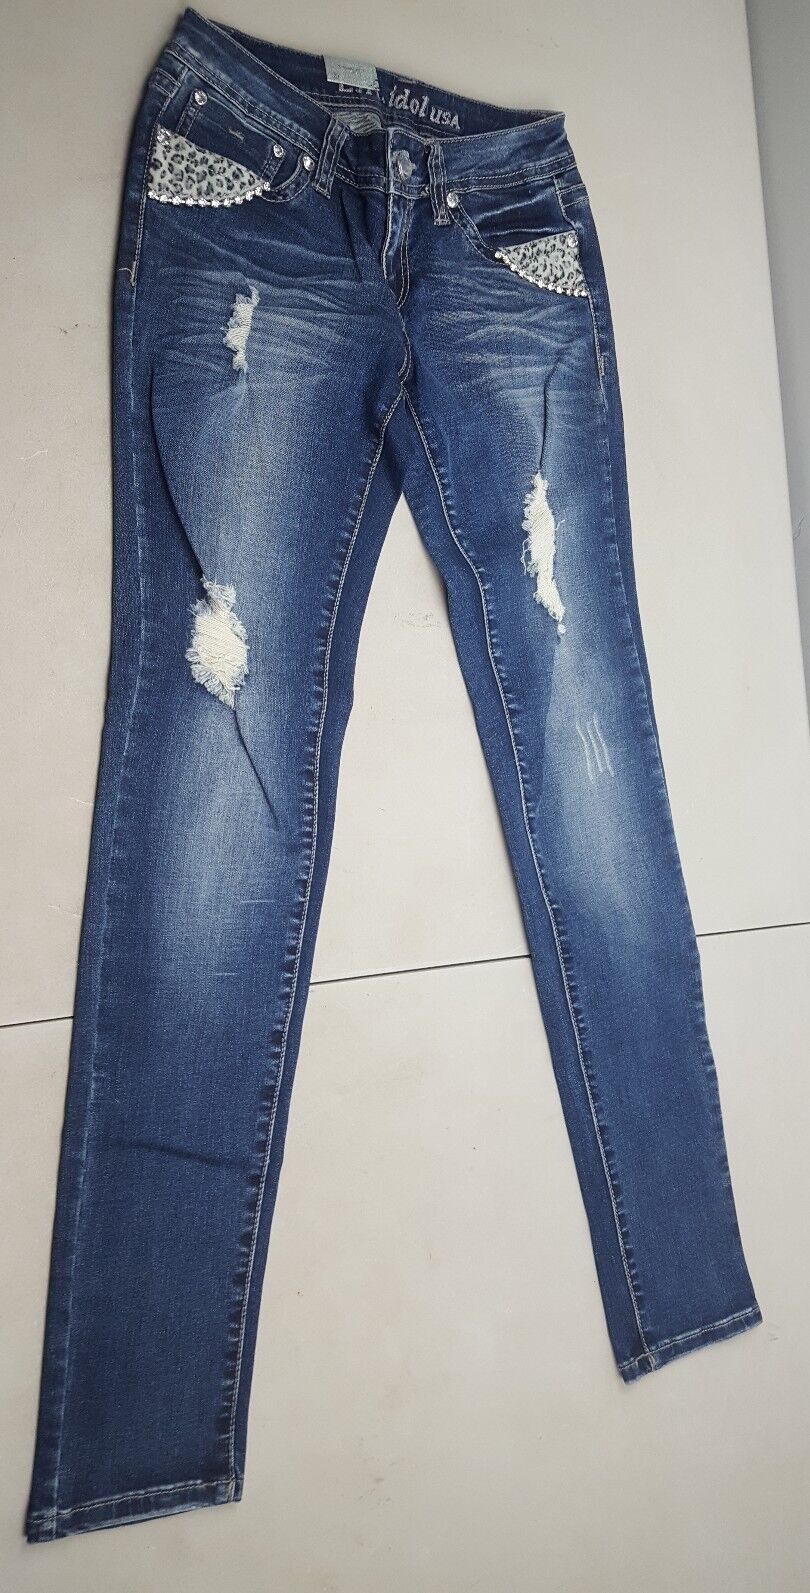 New La Idol USA Factory Distressed Fashion bluee Jeans Juniors Size 3 28w 31.5l